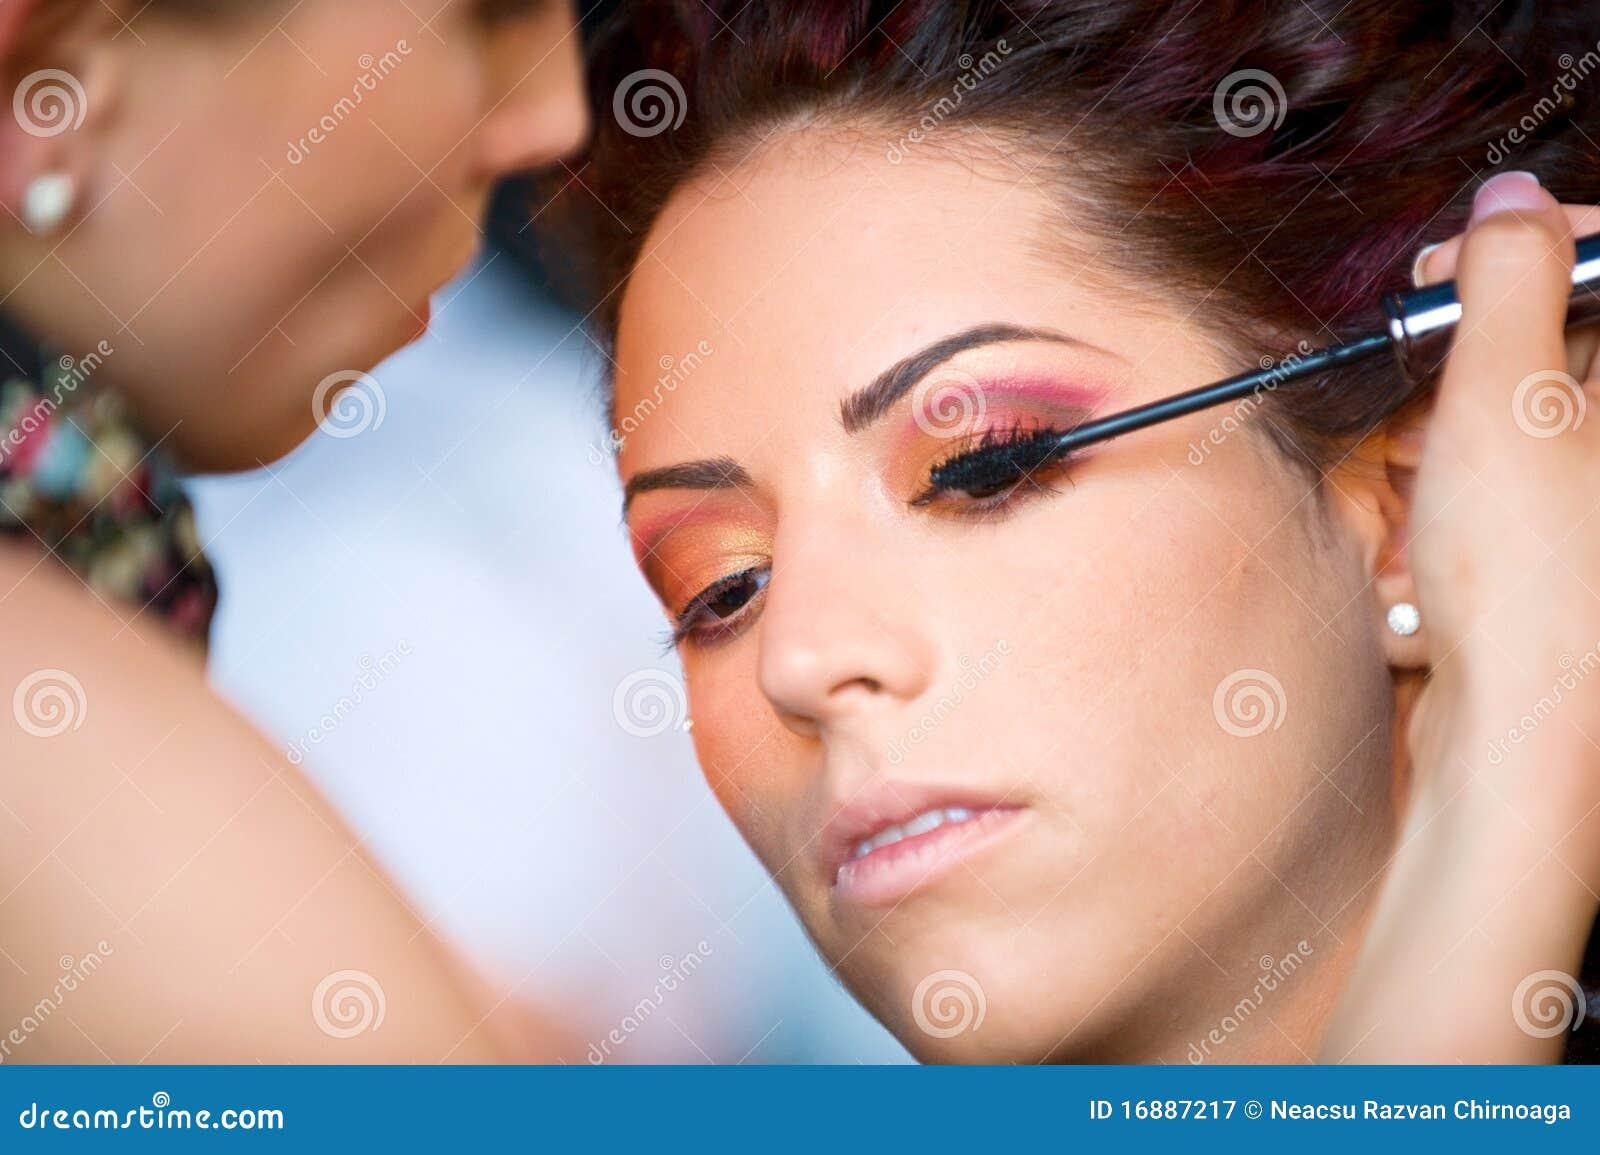 Make Up Session On Hair & Make Up Fest Editorial ...